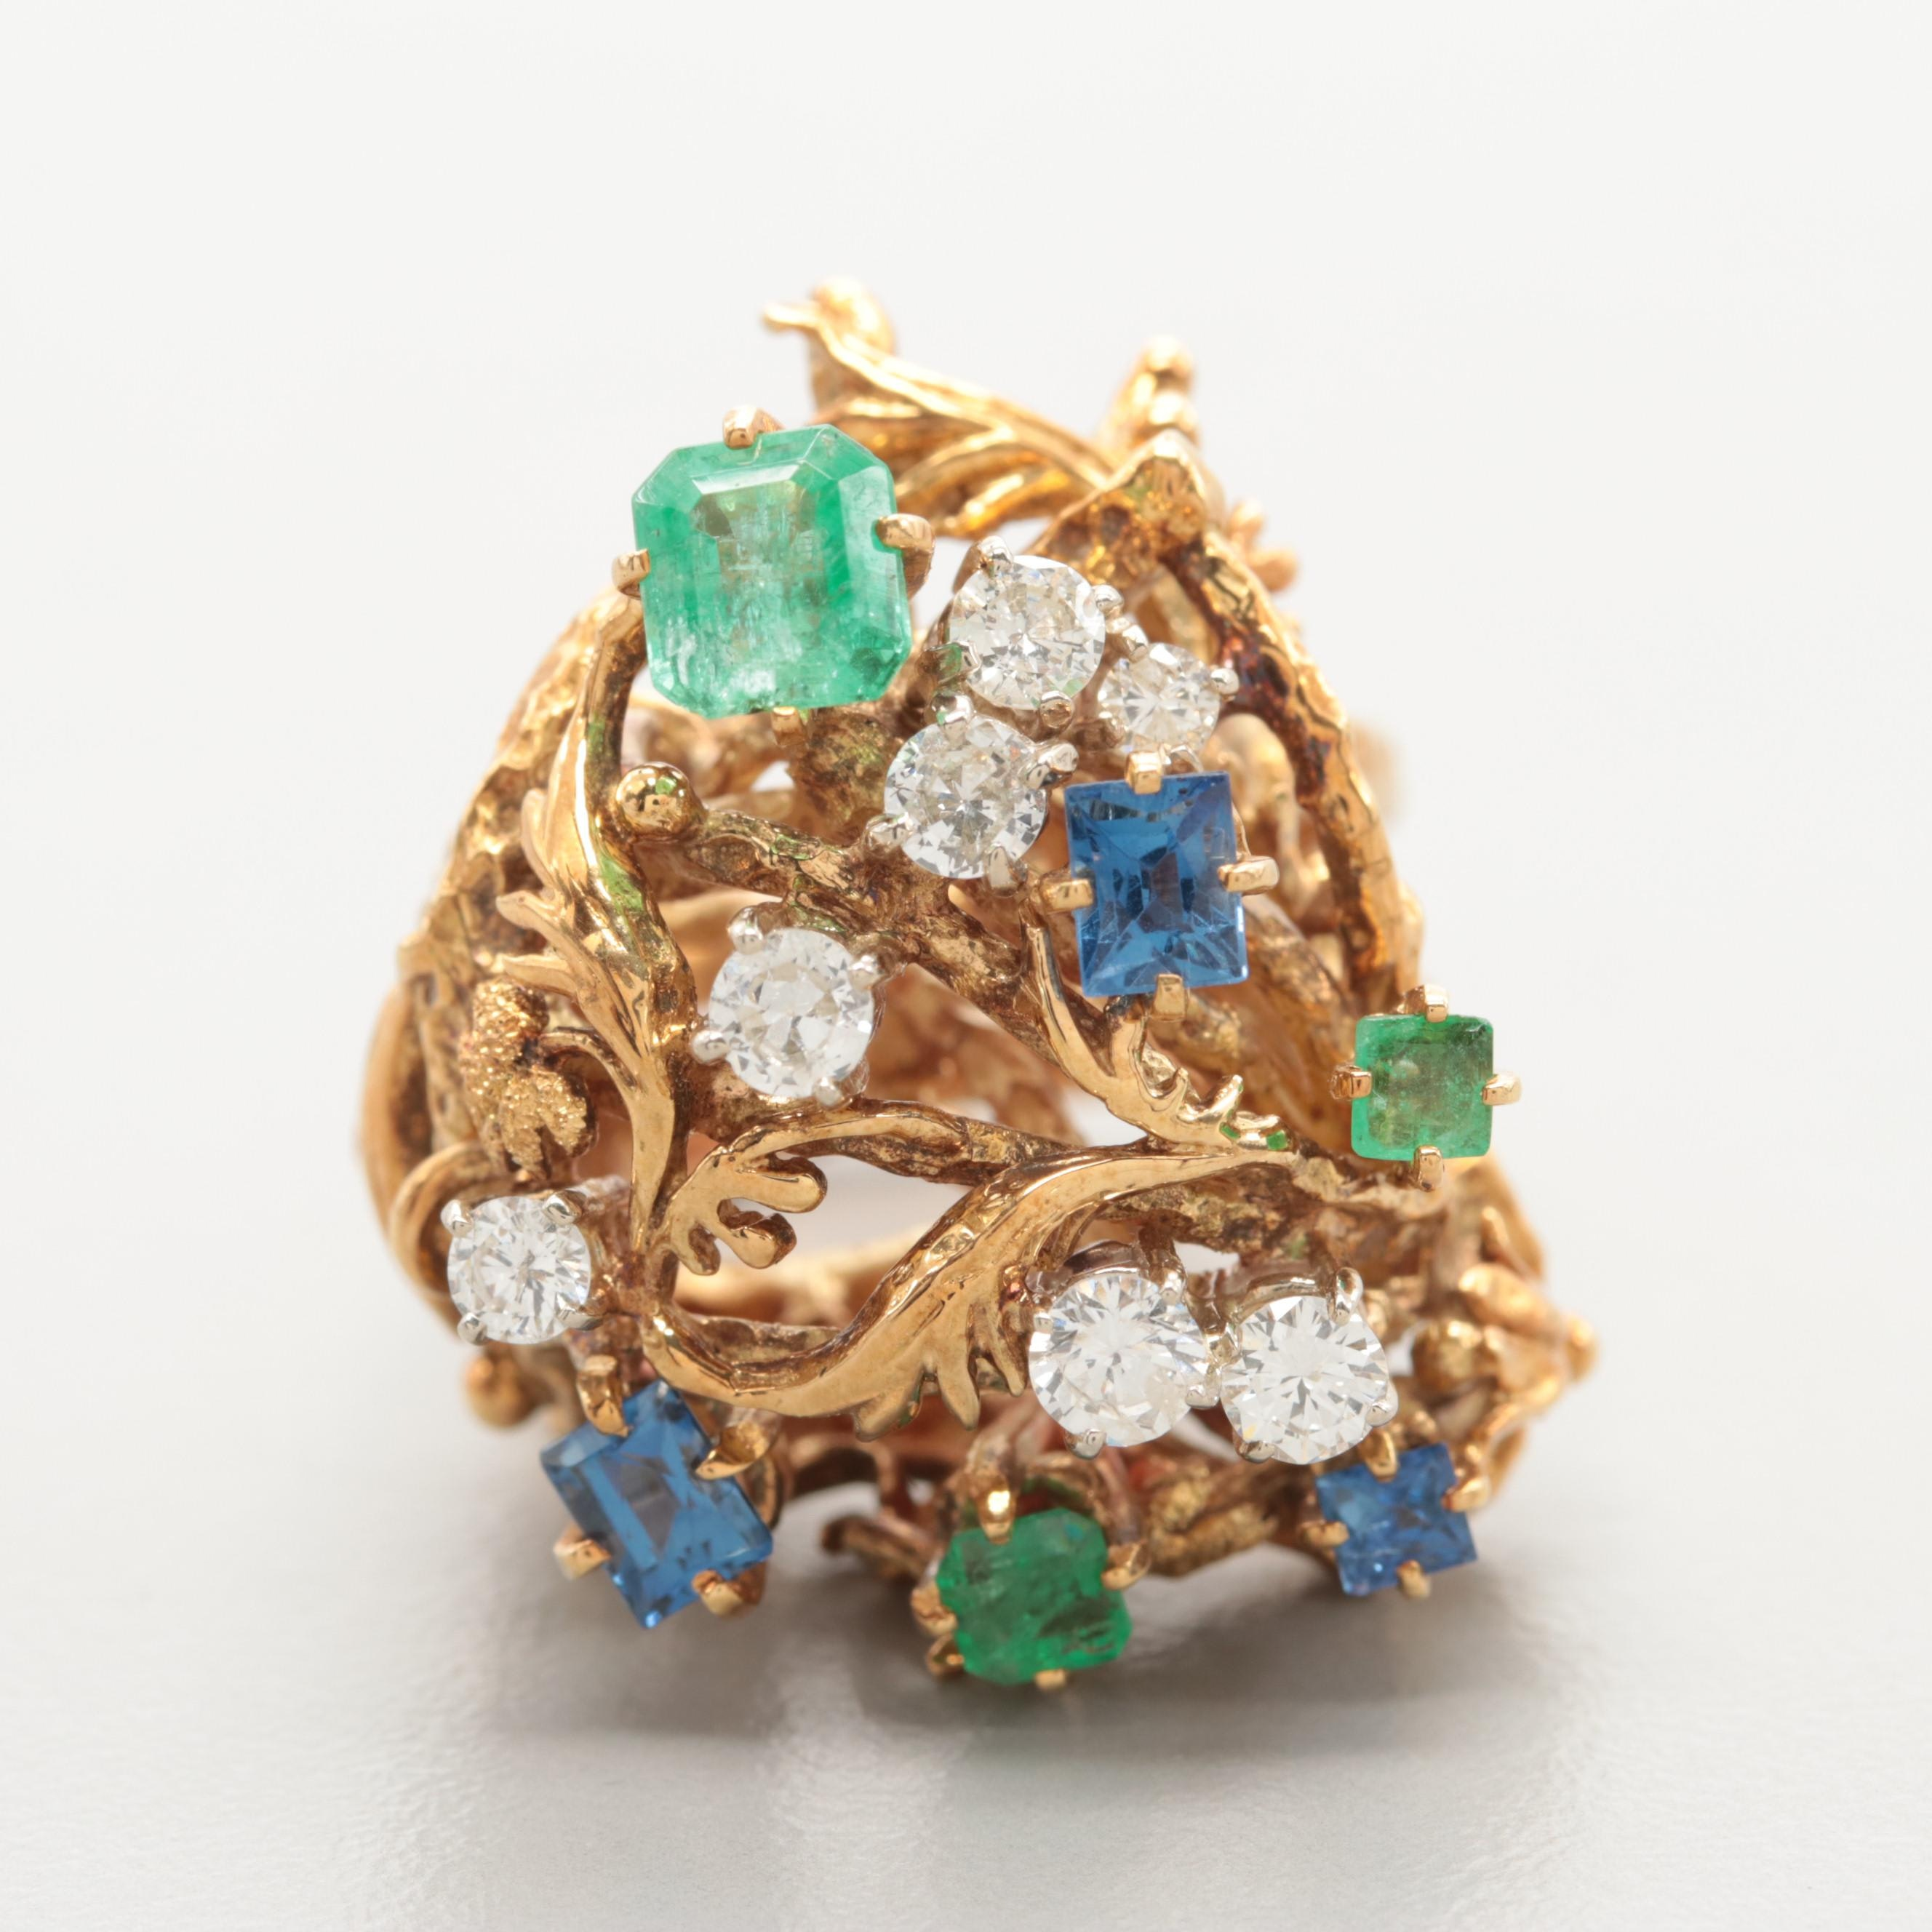 Circa 1970s Biomorphic 18K Yellow Gold Diamond, Emerald and Blue Sapphire Ring